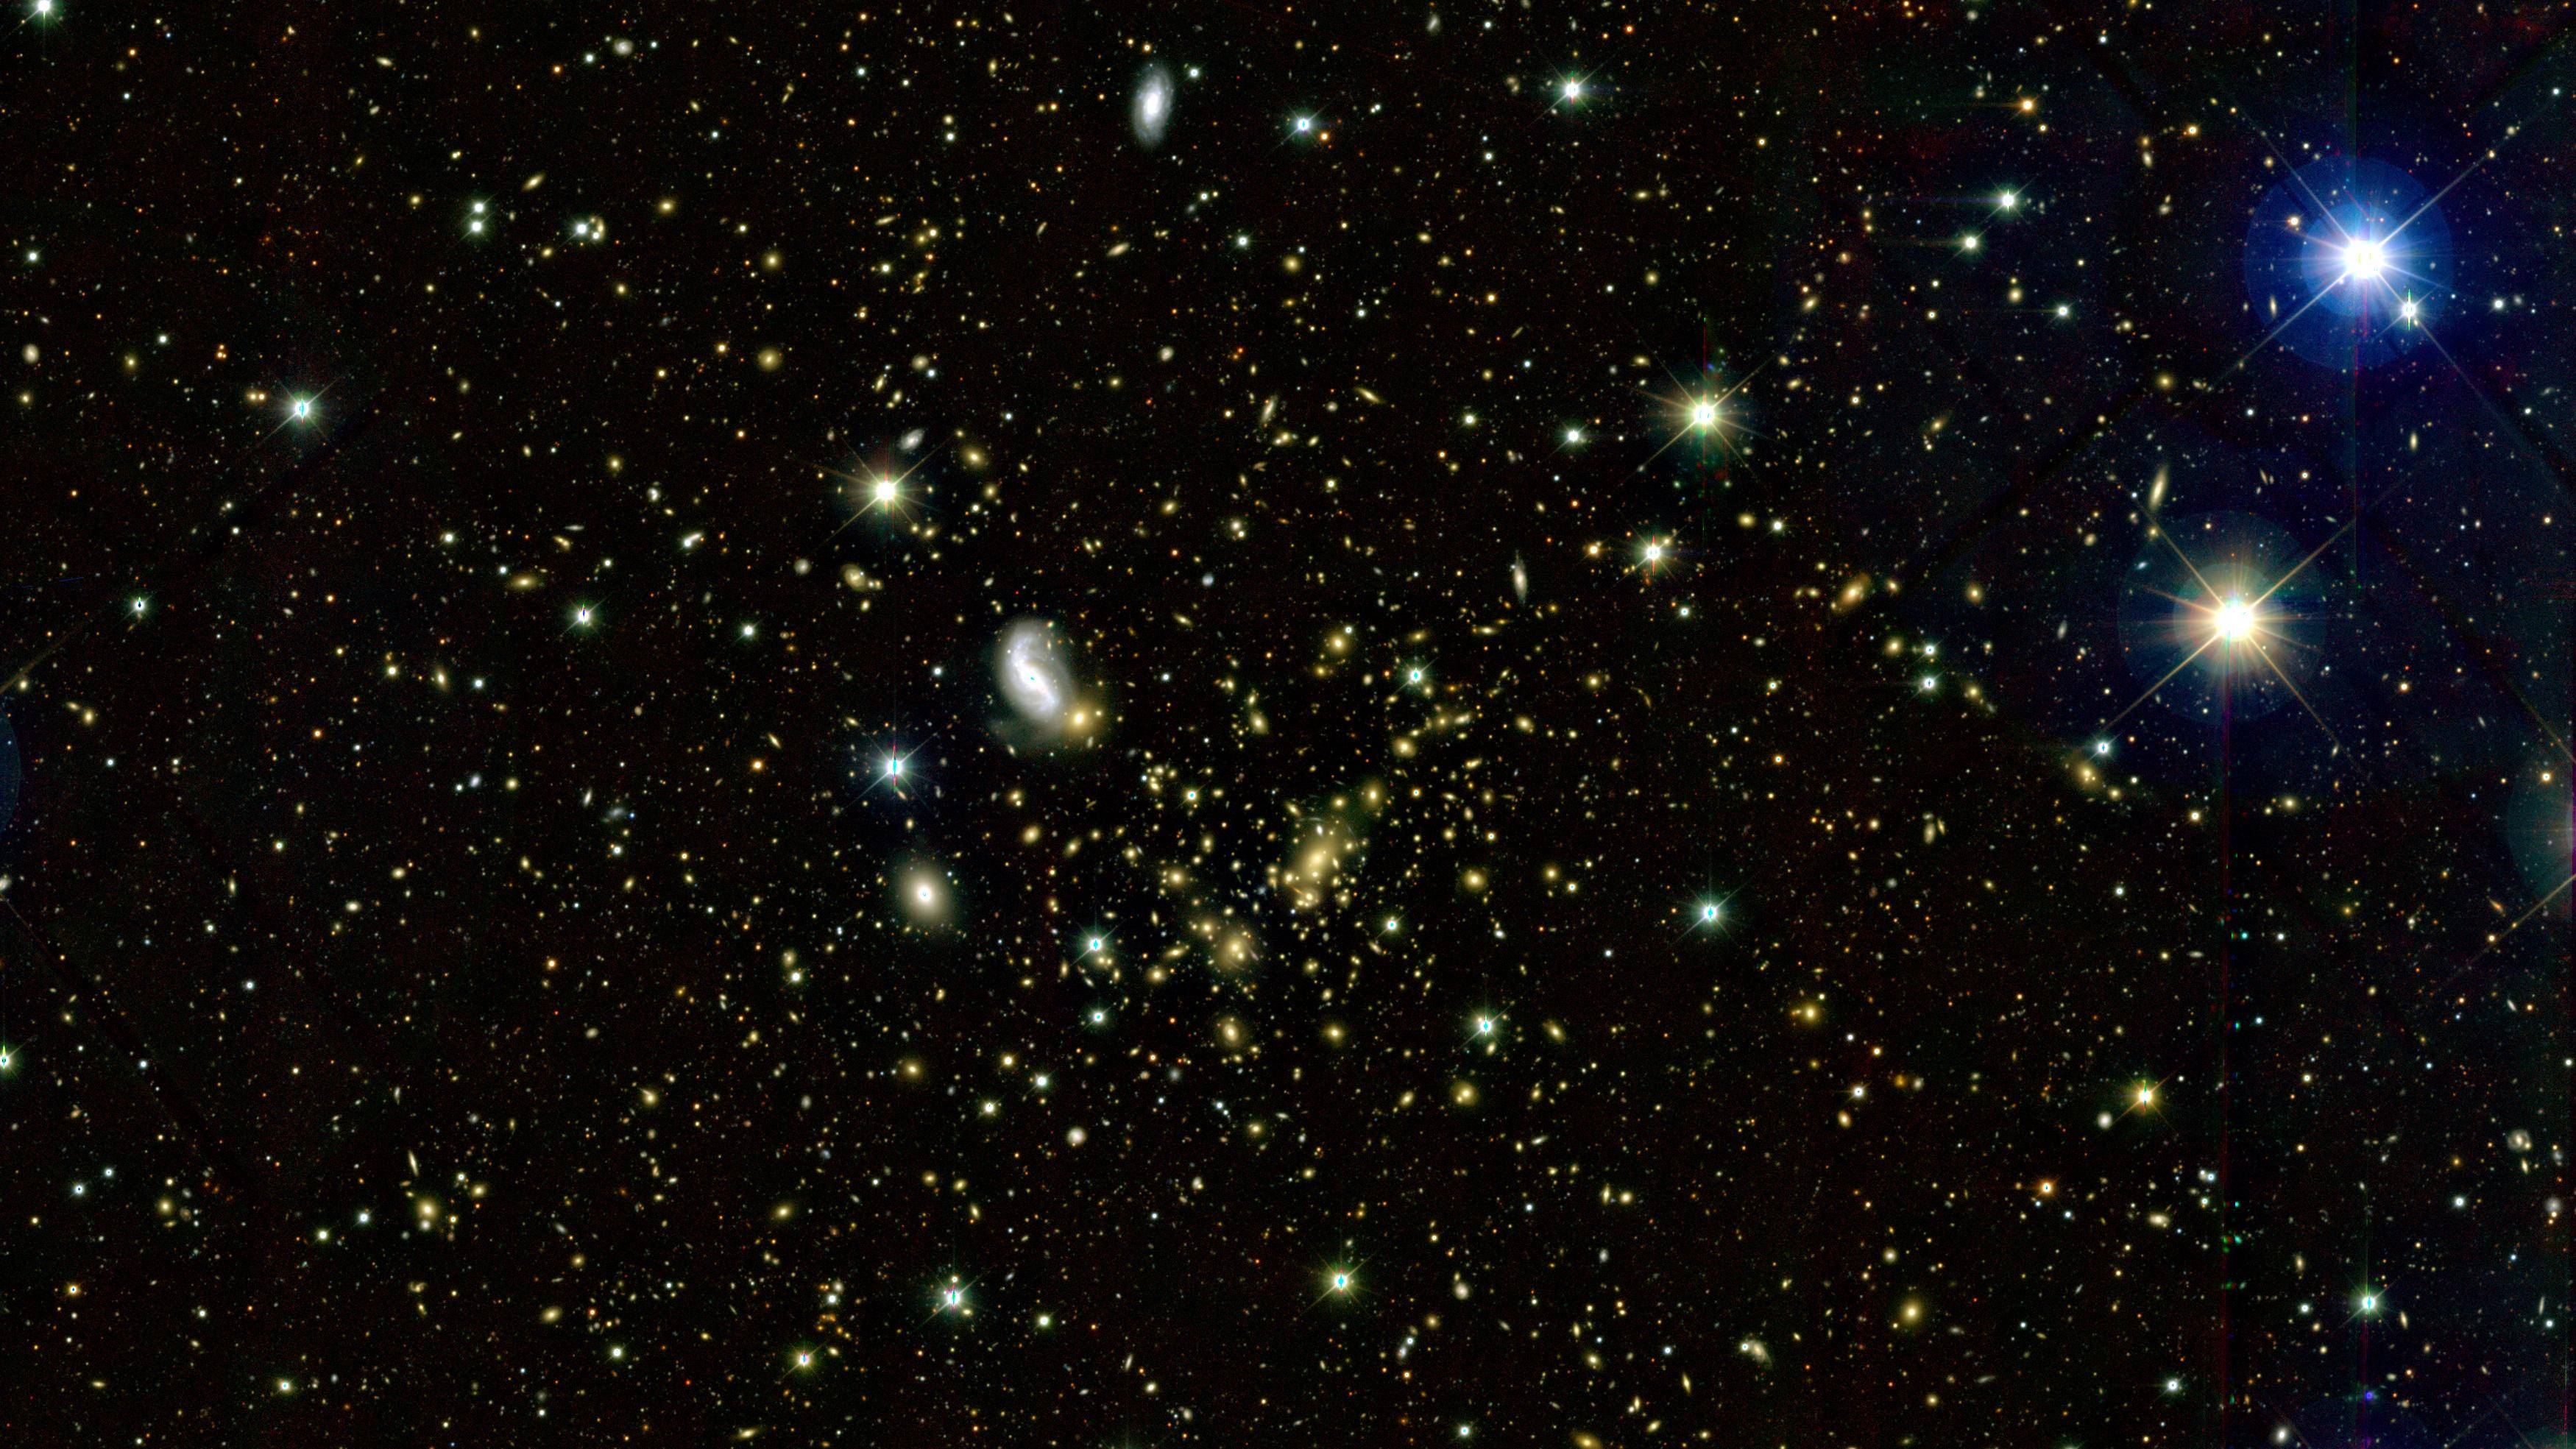 Nasa Iphone 5 Wallpaper Hubble Ultra Deep Field Wallpapers Wallpaper Cave